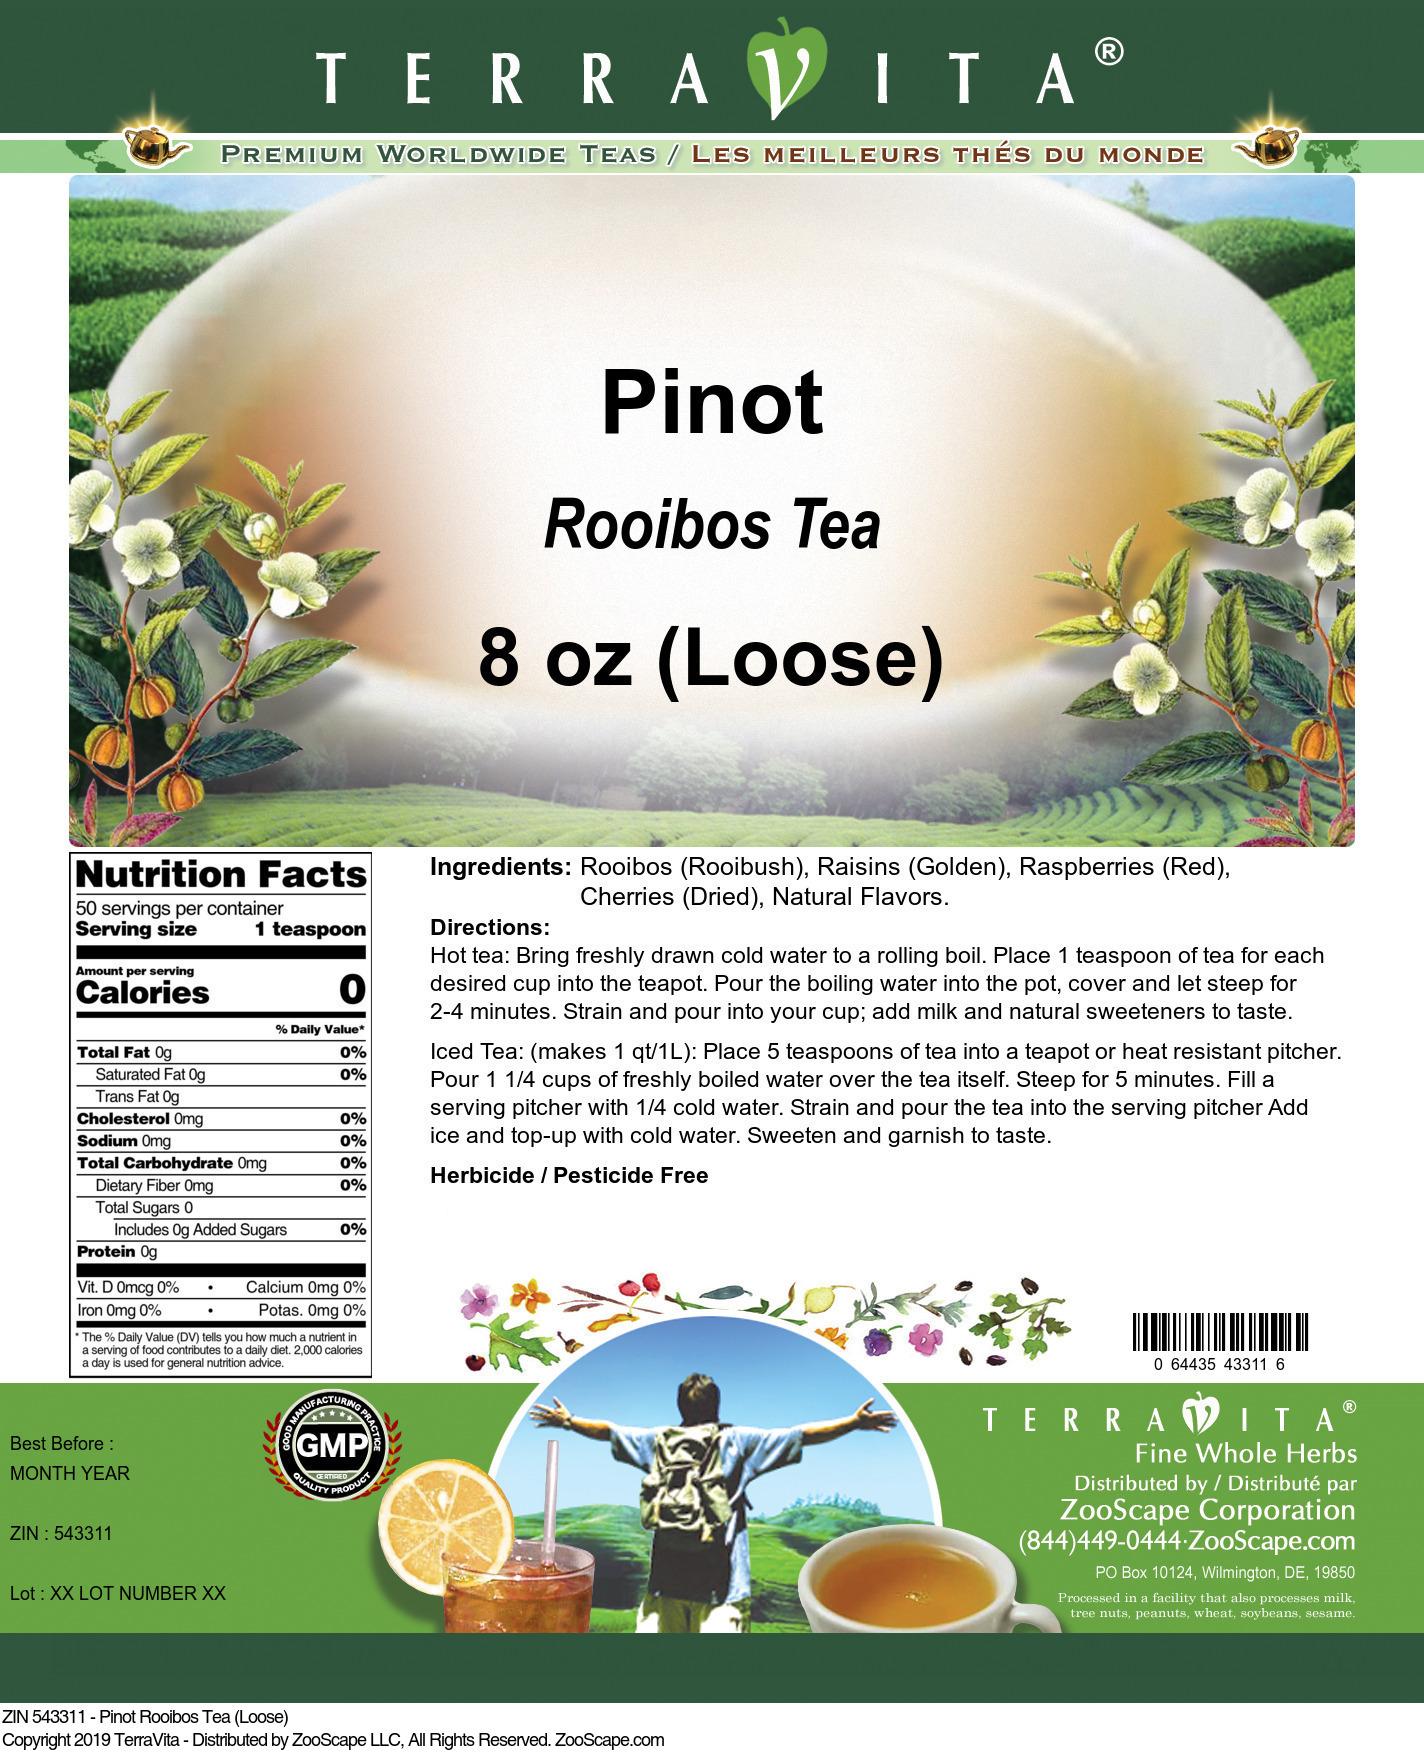 Pinot Rooibos Tea